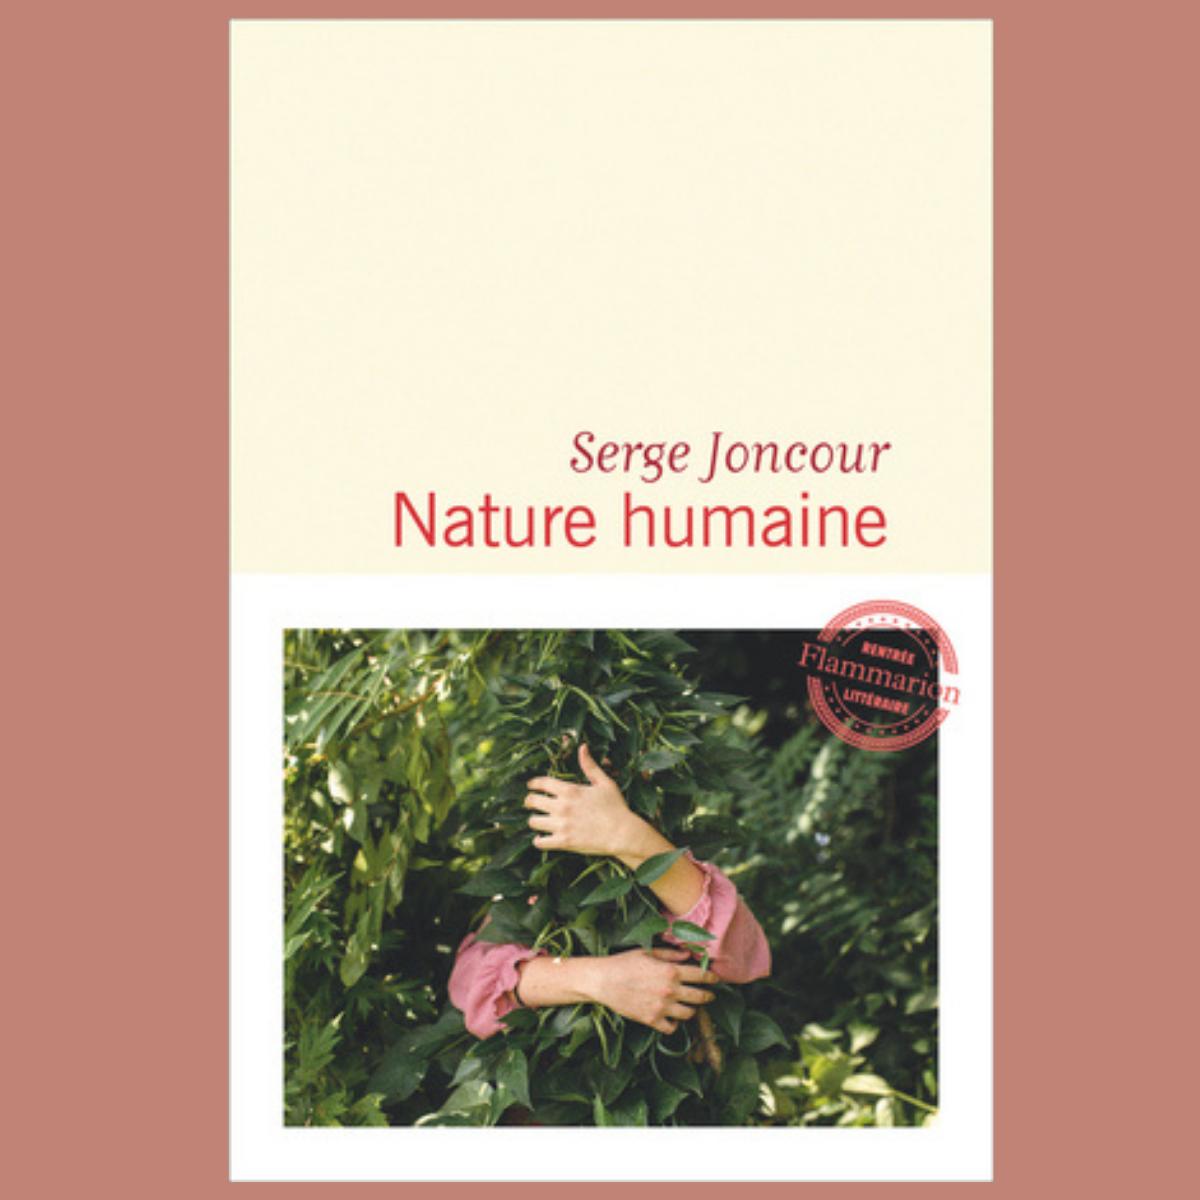 Nature humaine - Serge Joncour (Flammarion))